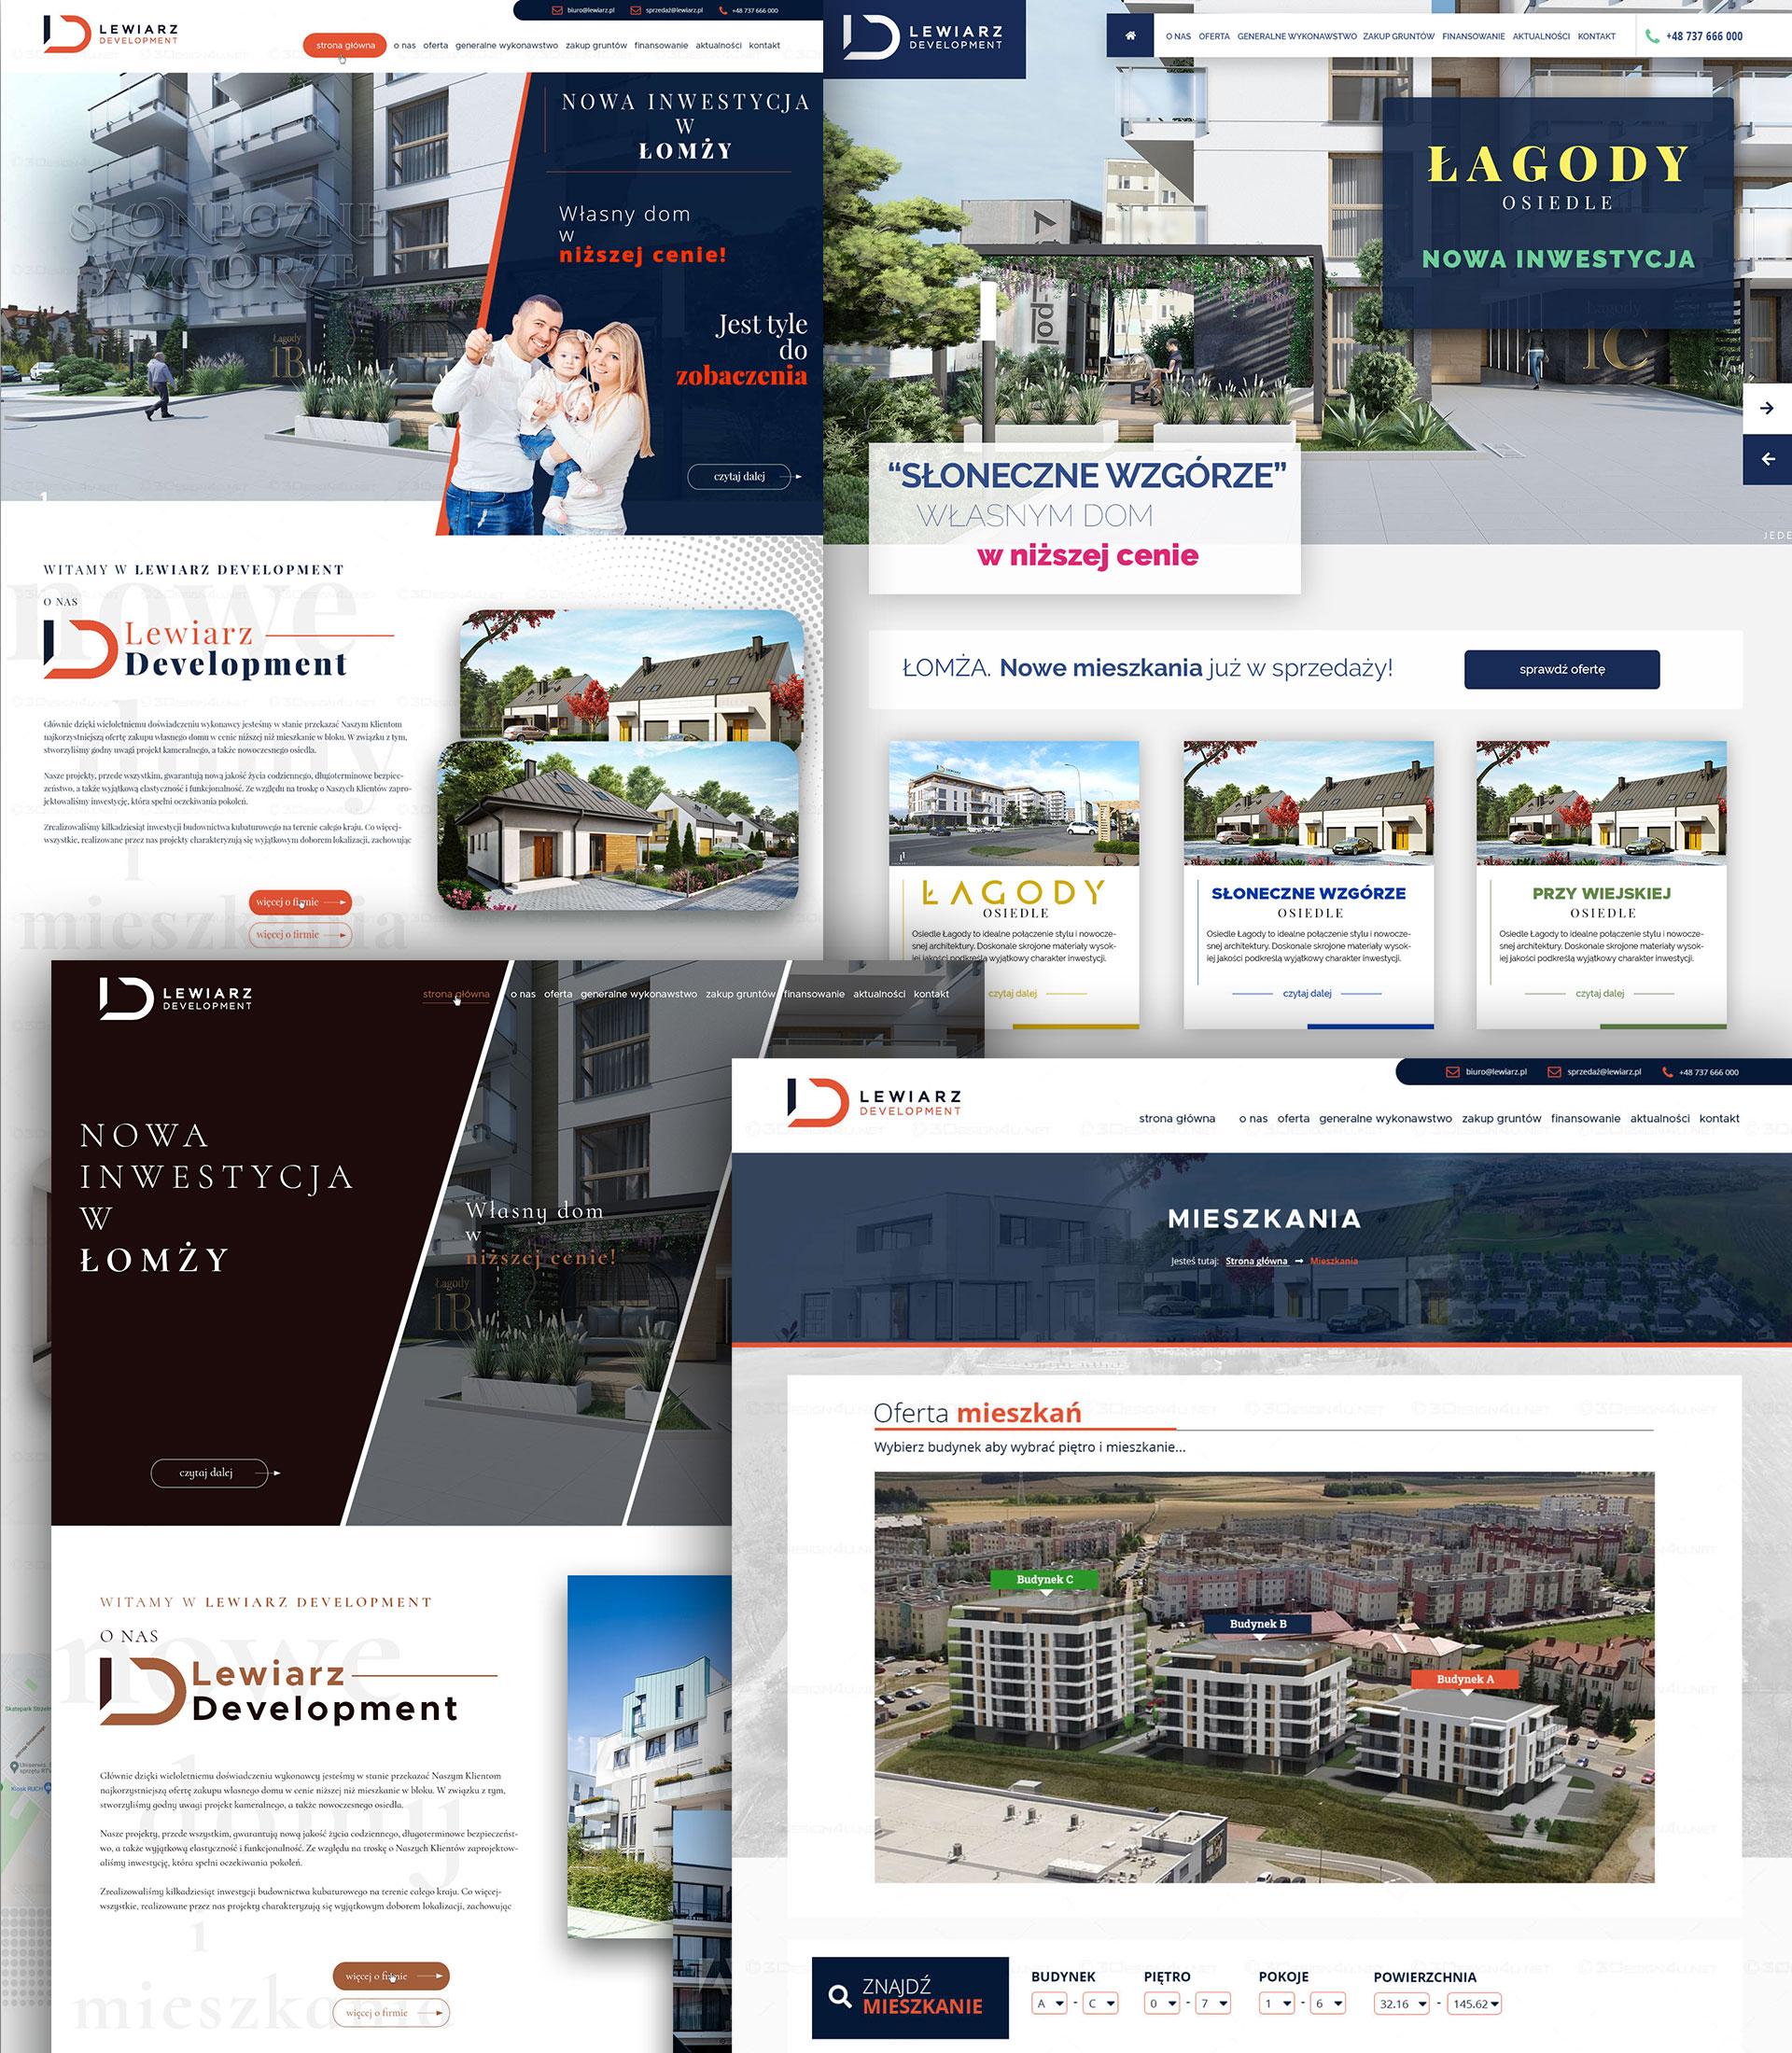 portfolio/016/012216/lewiarz-home-preview.jpg